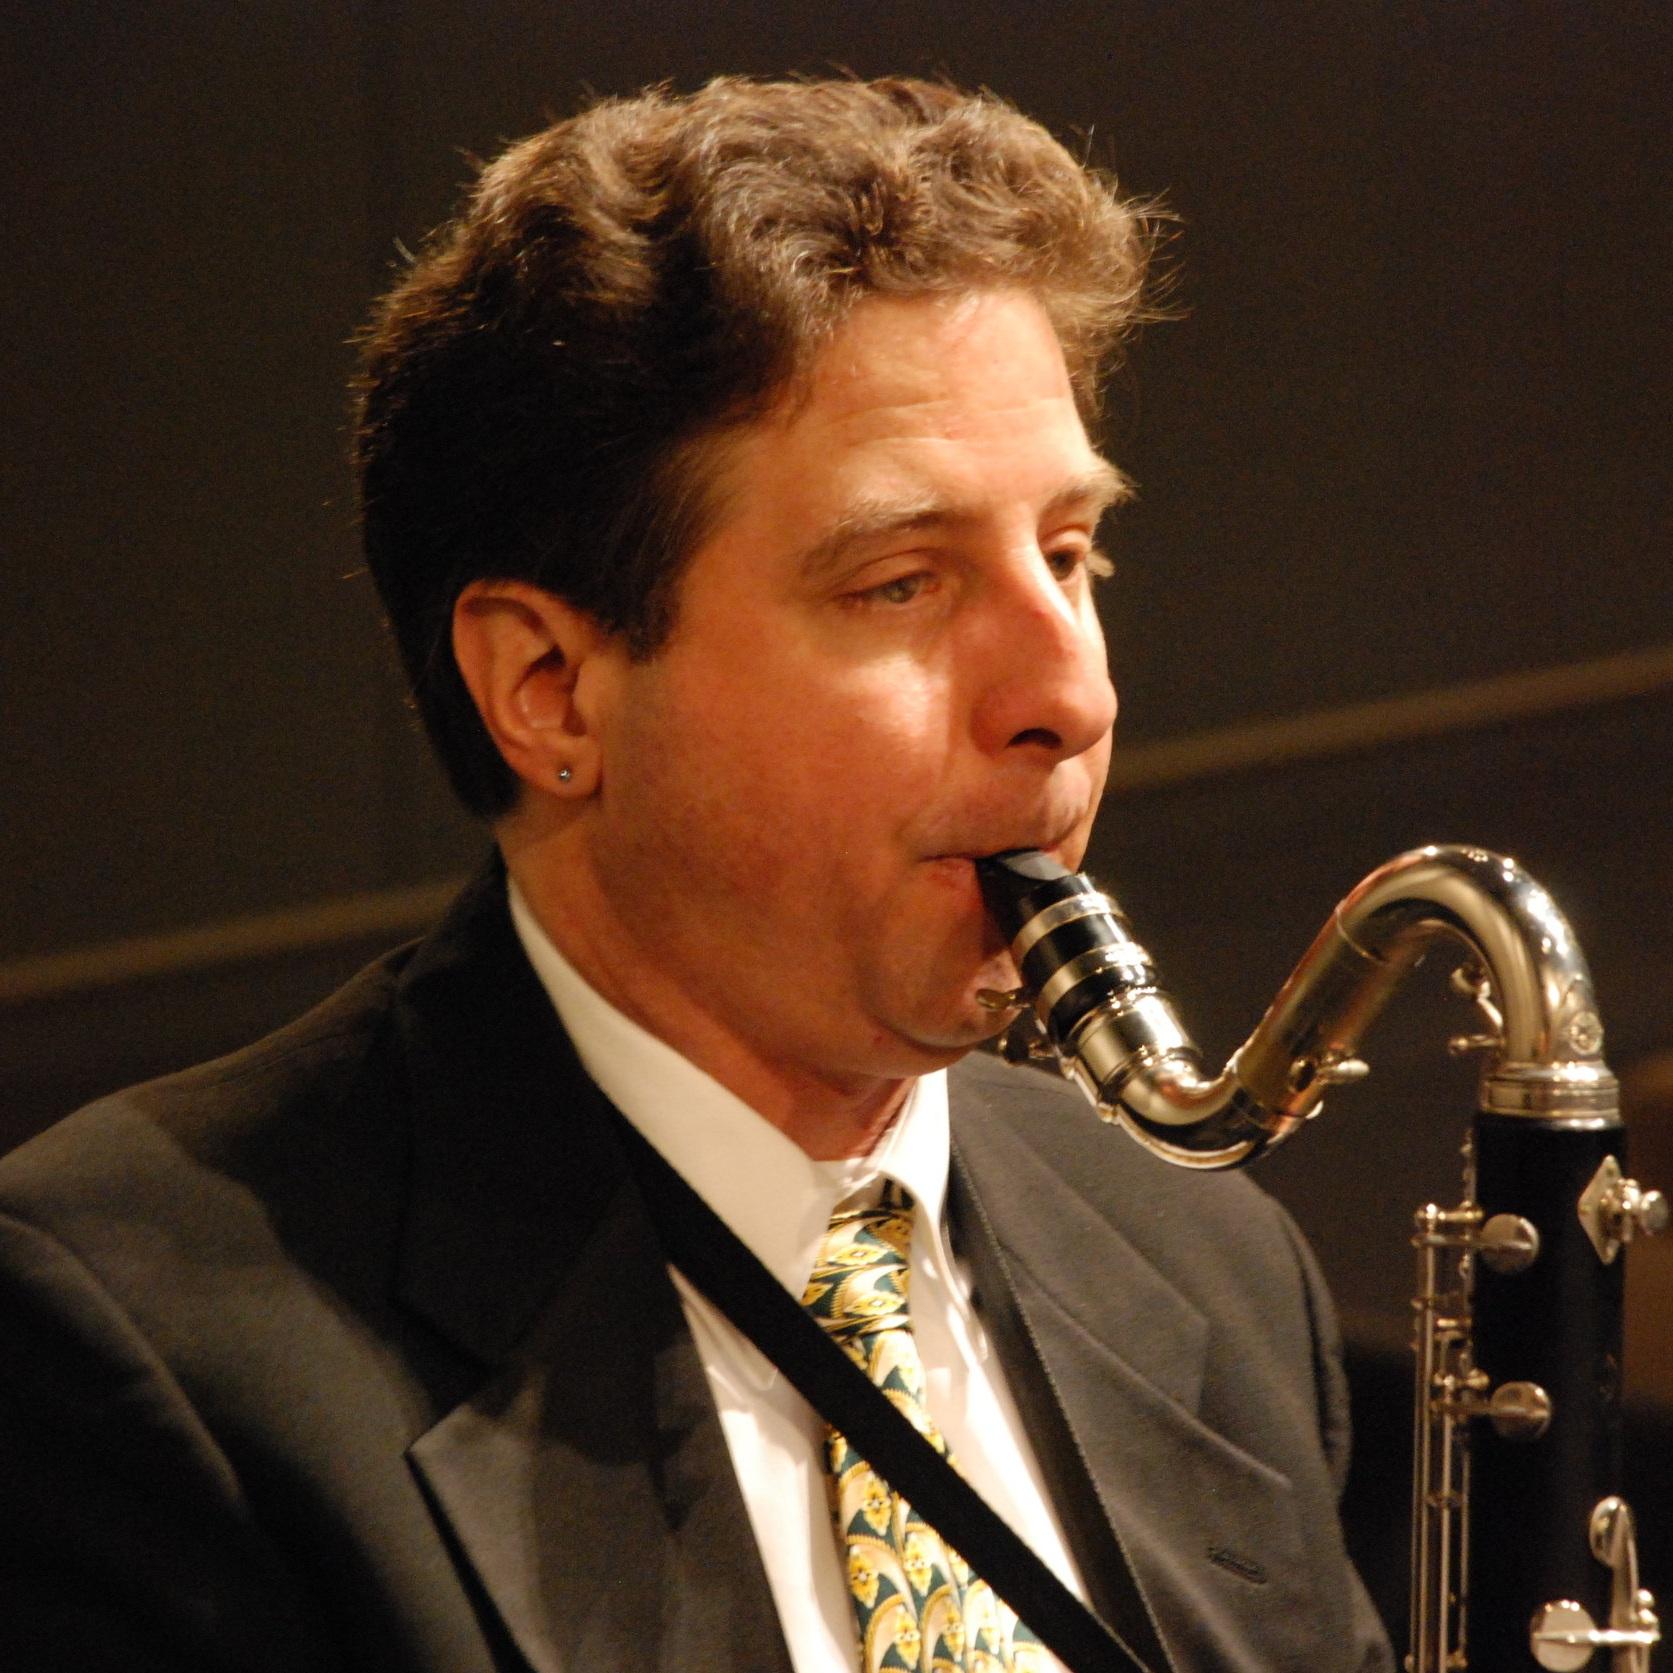 Paul Schulz, bass clarinet